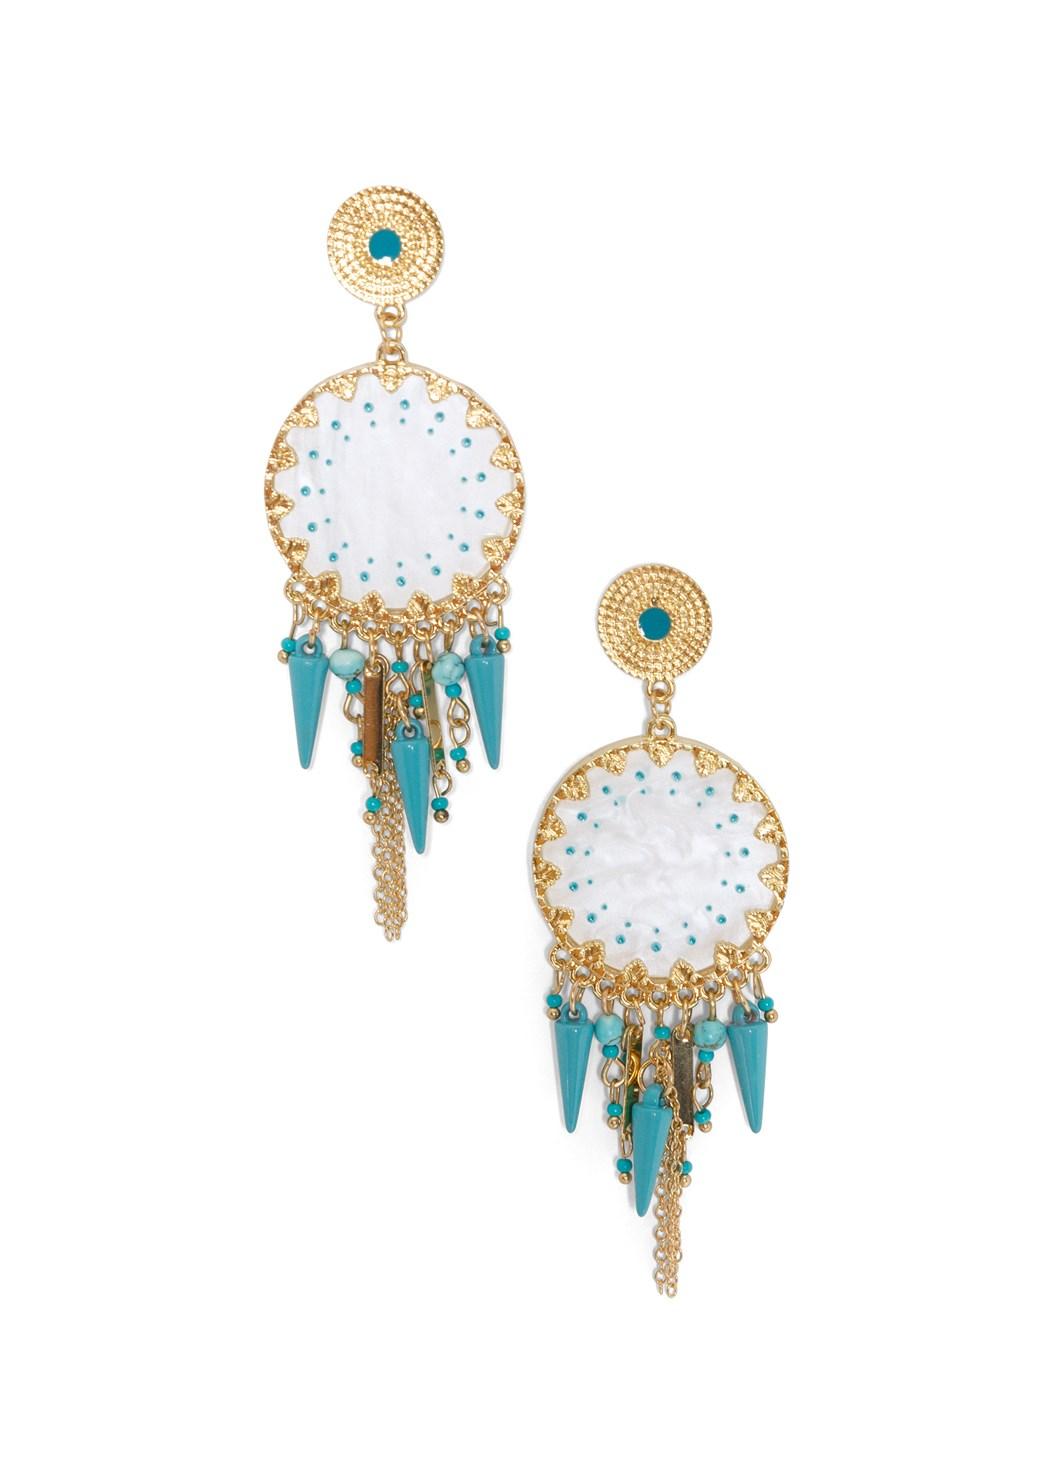 Shell Fringe Earring,Open Knit Maxi Sweater Dress,Rhinestone Thong Sandal,Shell Pendant Necklace